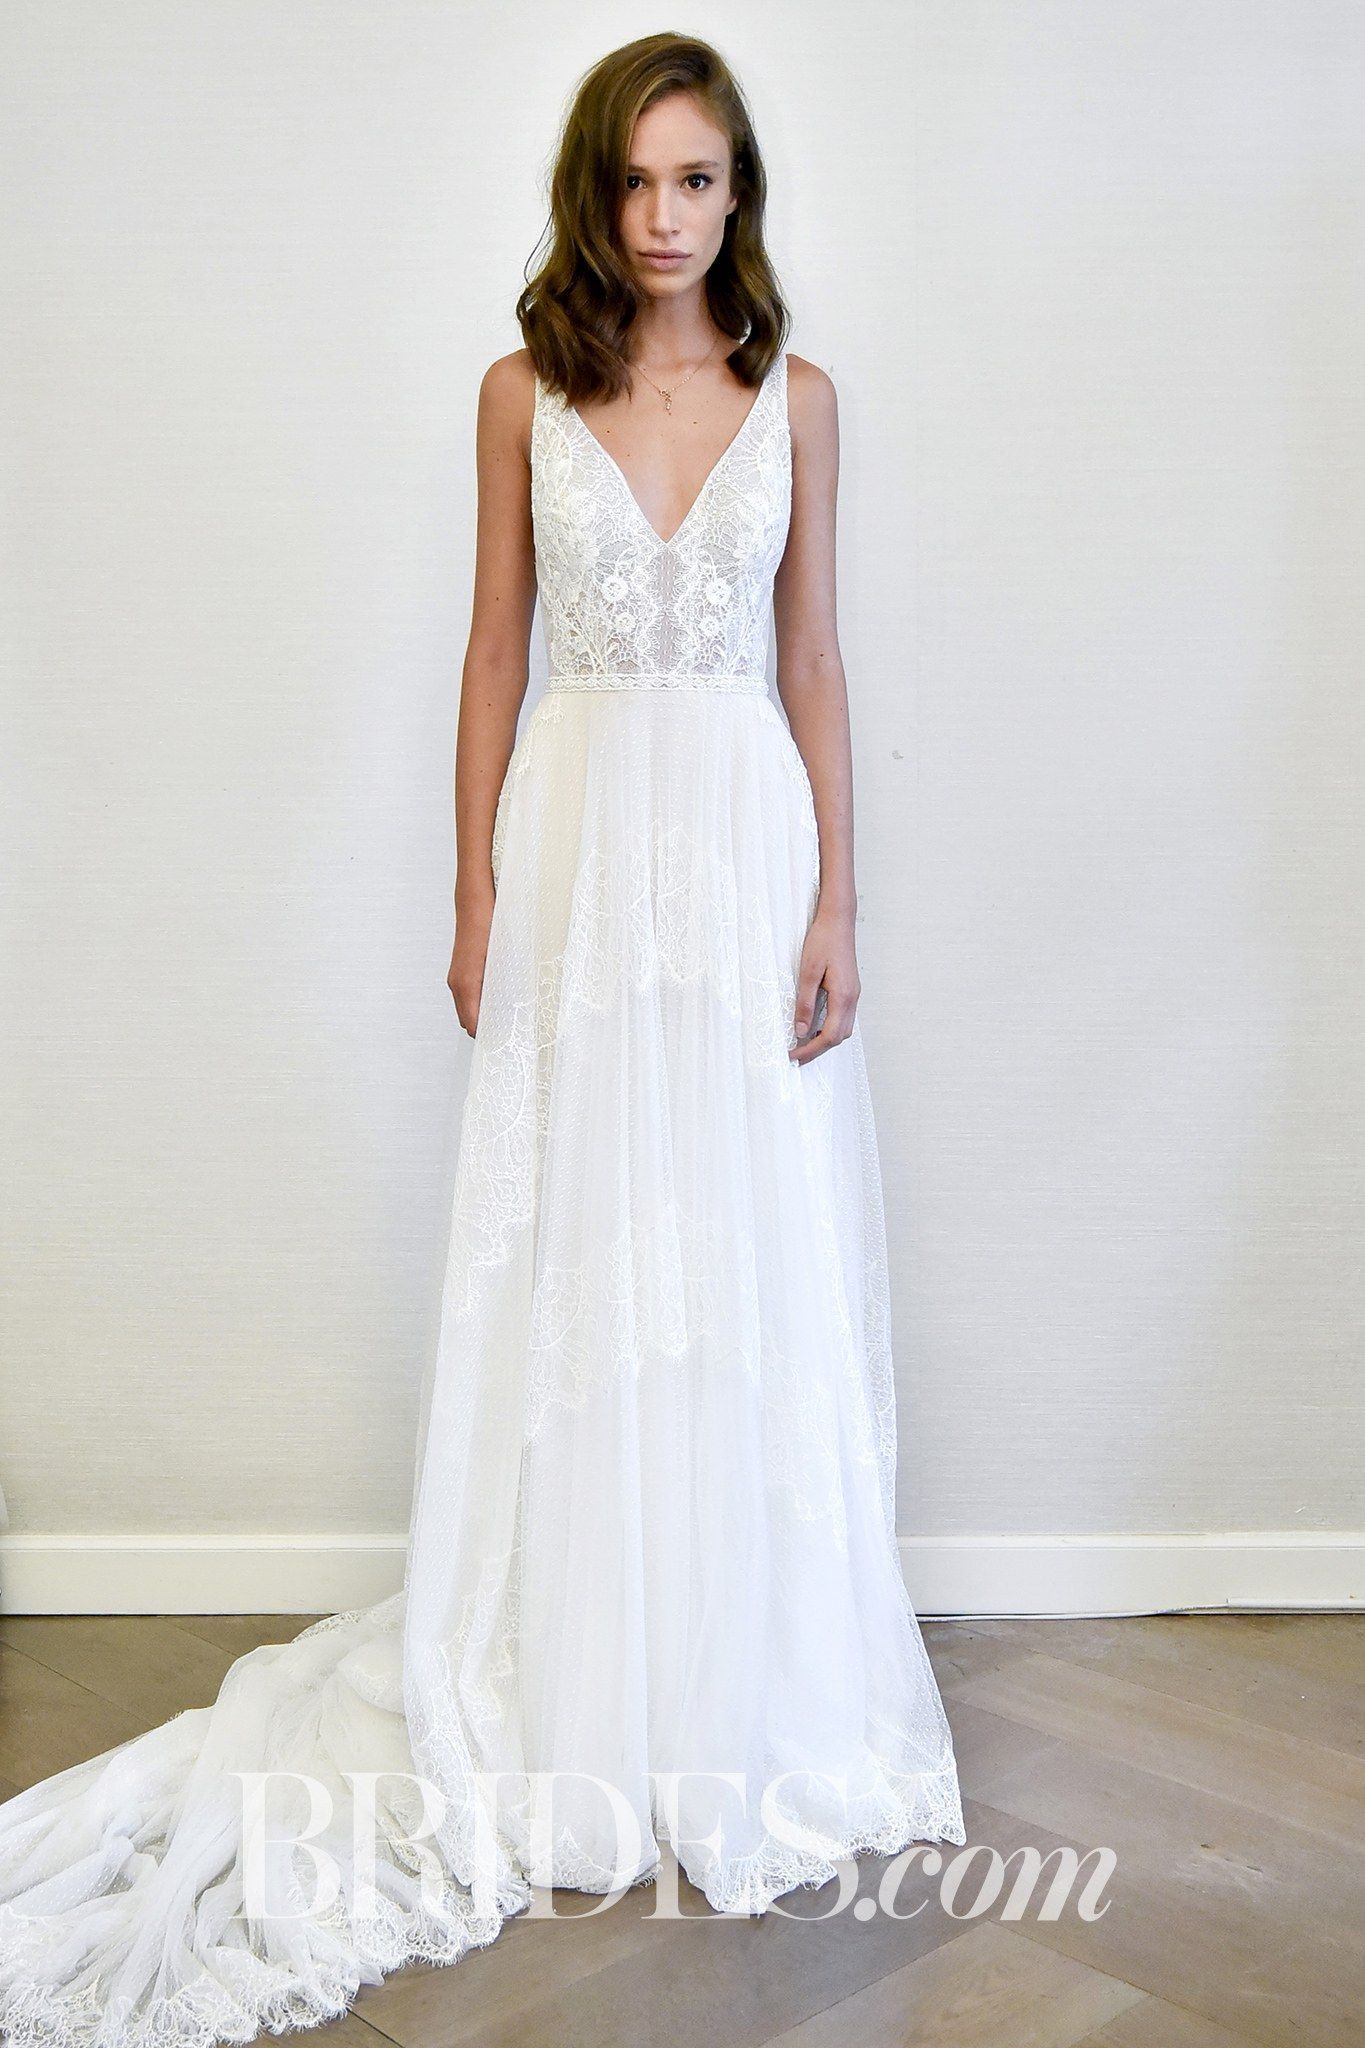 Flora bridal wedding dress collection spring 2018 brides 2018 flora bridal wedding dress collection spring 2018 brides junglespirit Image collections